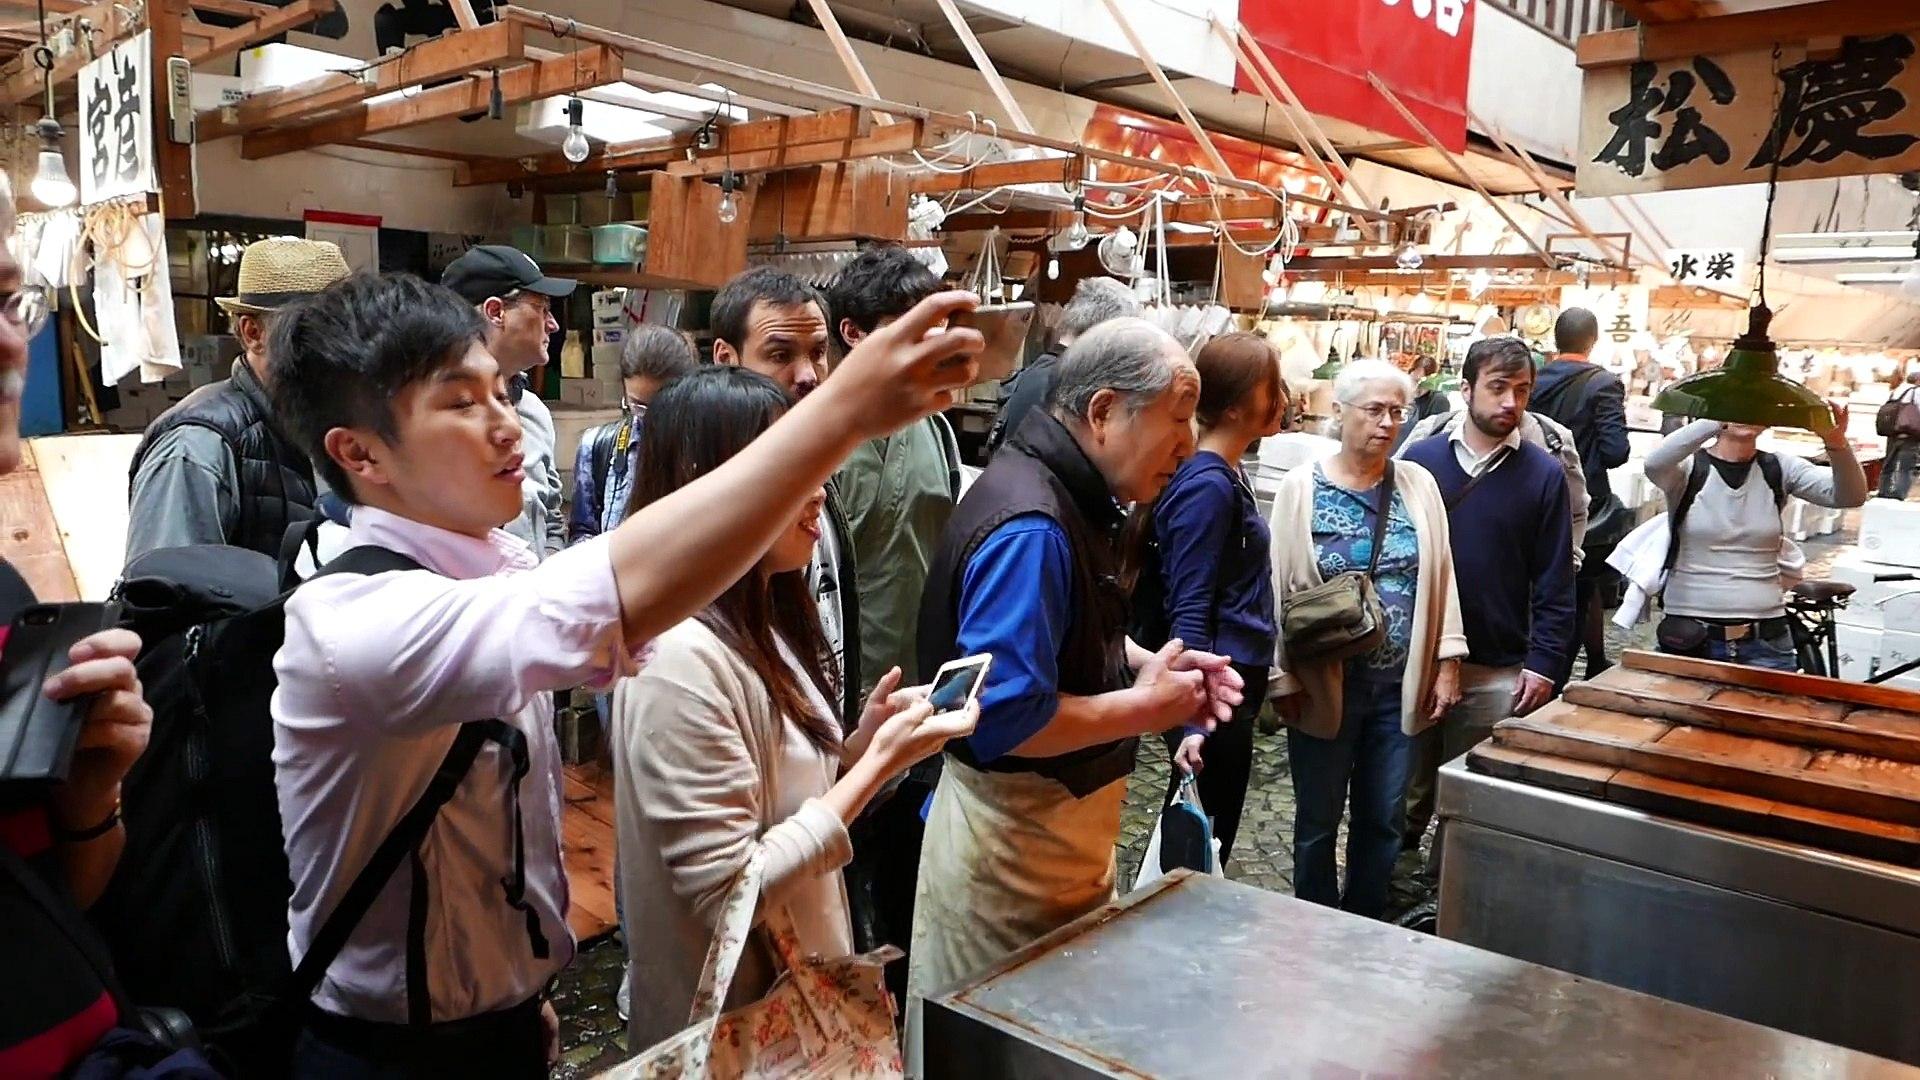 Japanese Street Food - GIANT SUNFISH Mola Mola Tokyo Japan